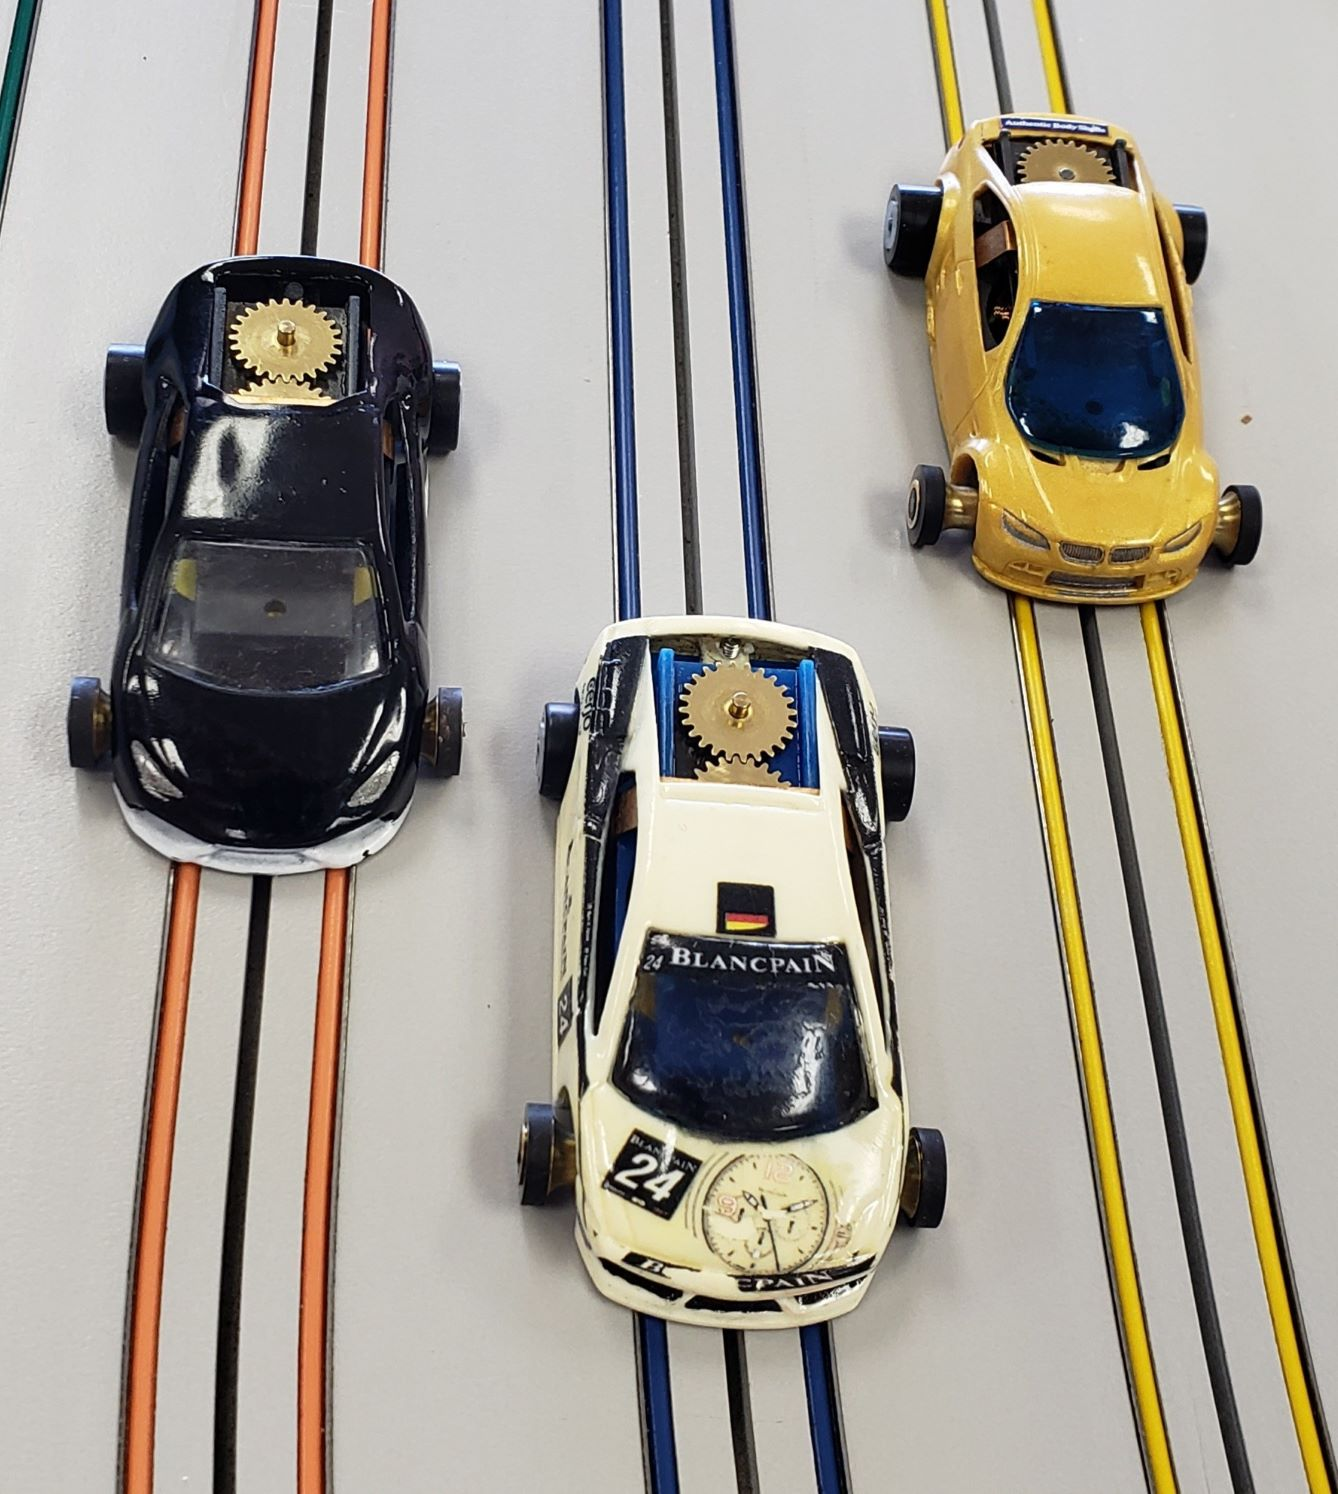 3-20 E-Fray podium cars.jpg